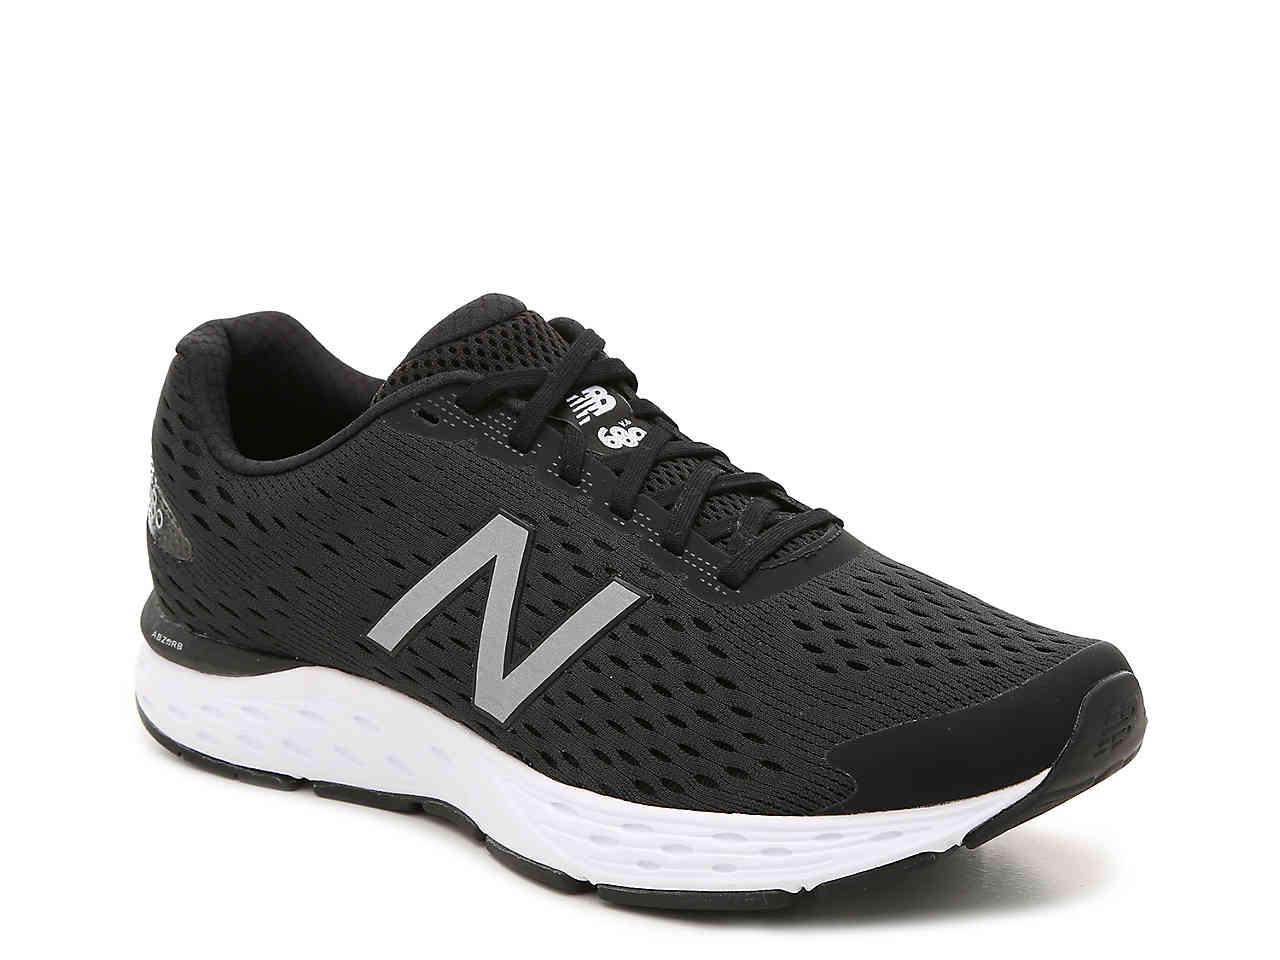 New Balance Synthetic 680 V6 Running Shoe in Black for Men - Lyst